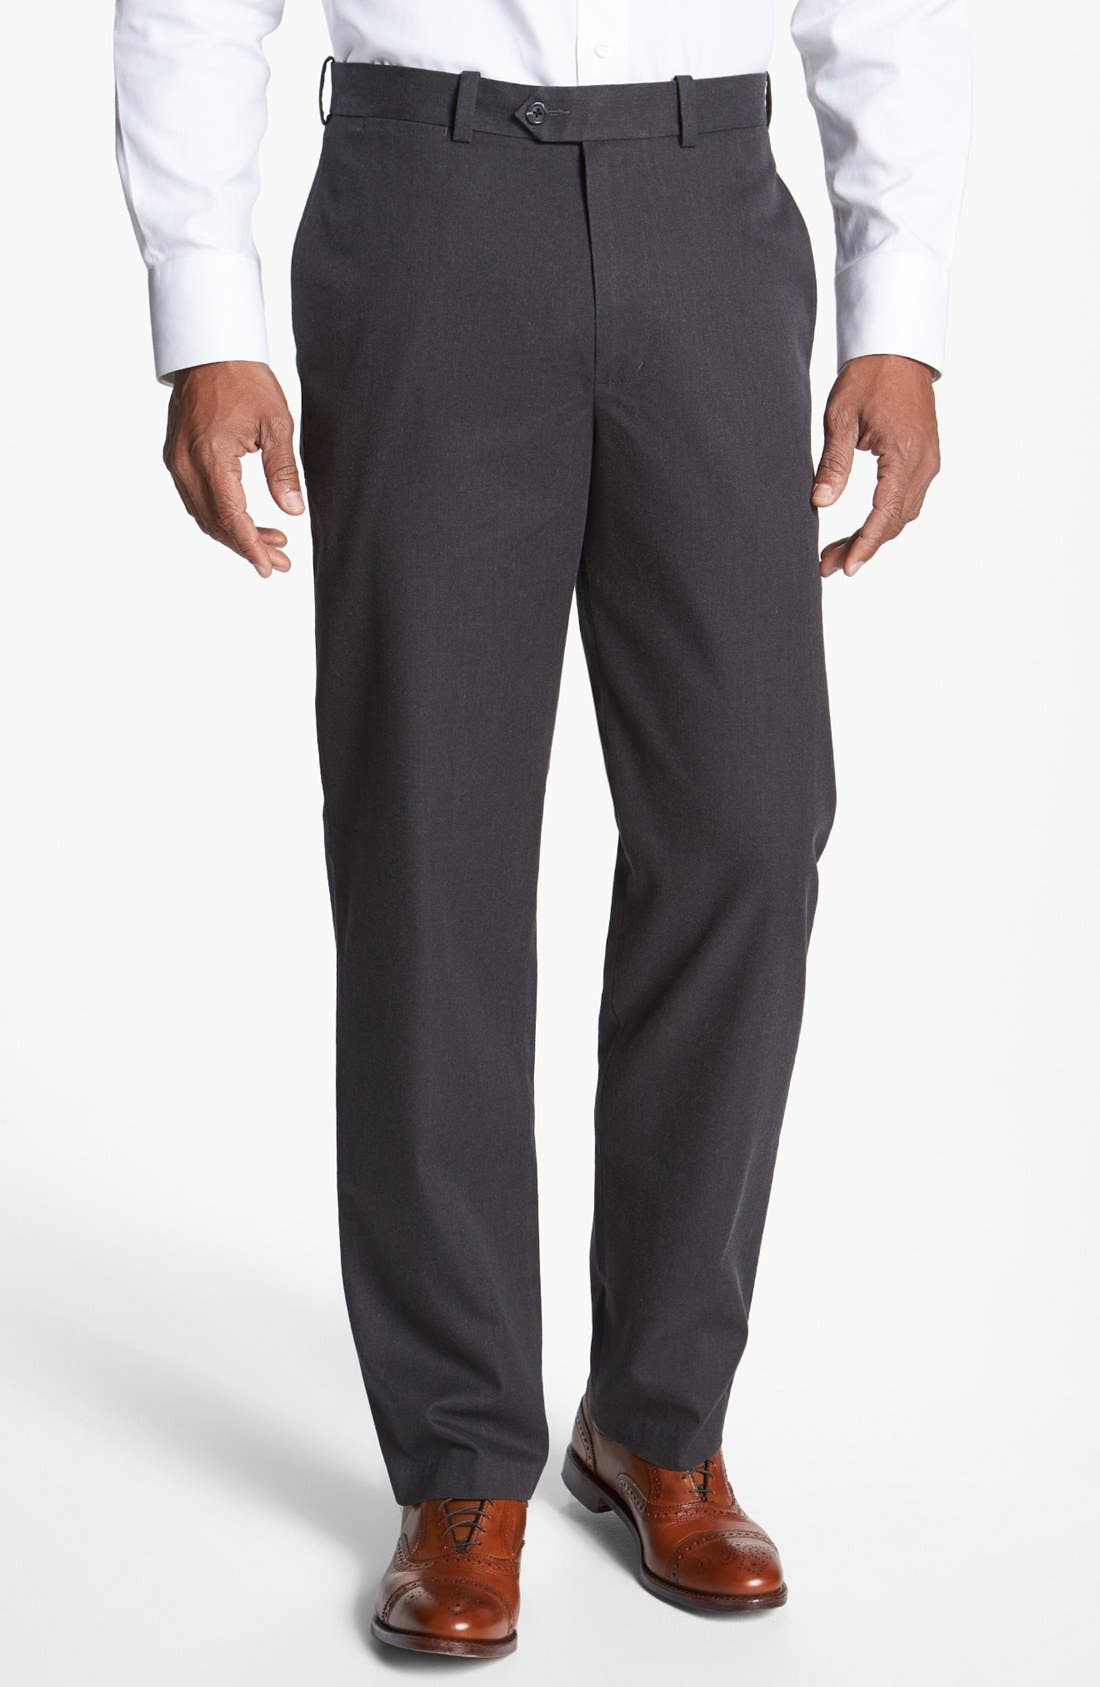 Alternate Image 1 Selected - John W. Nordstrom® Mélange Supima® Cotton Pants